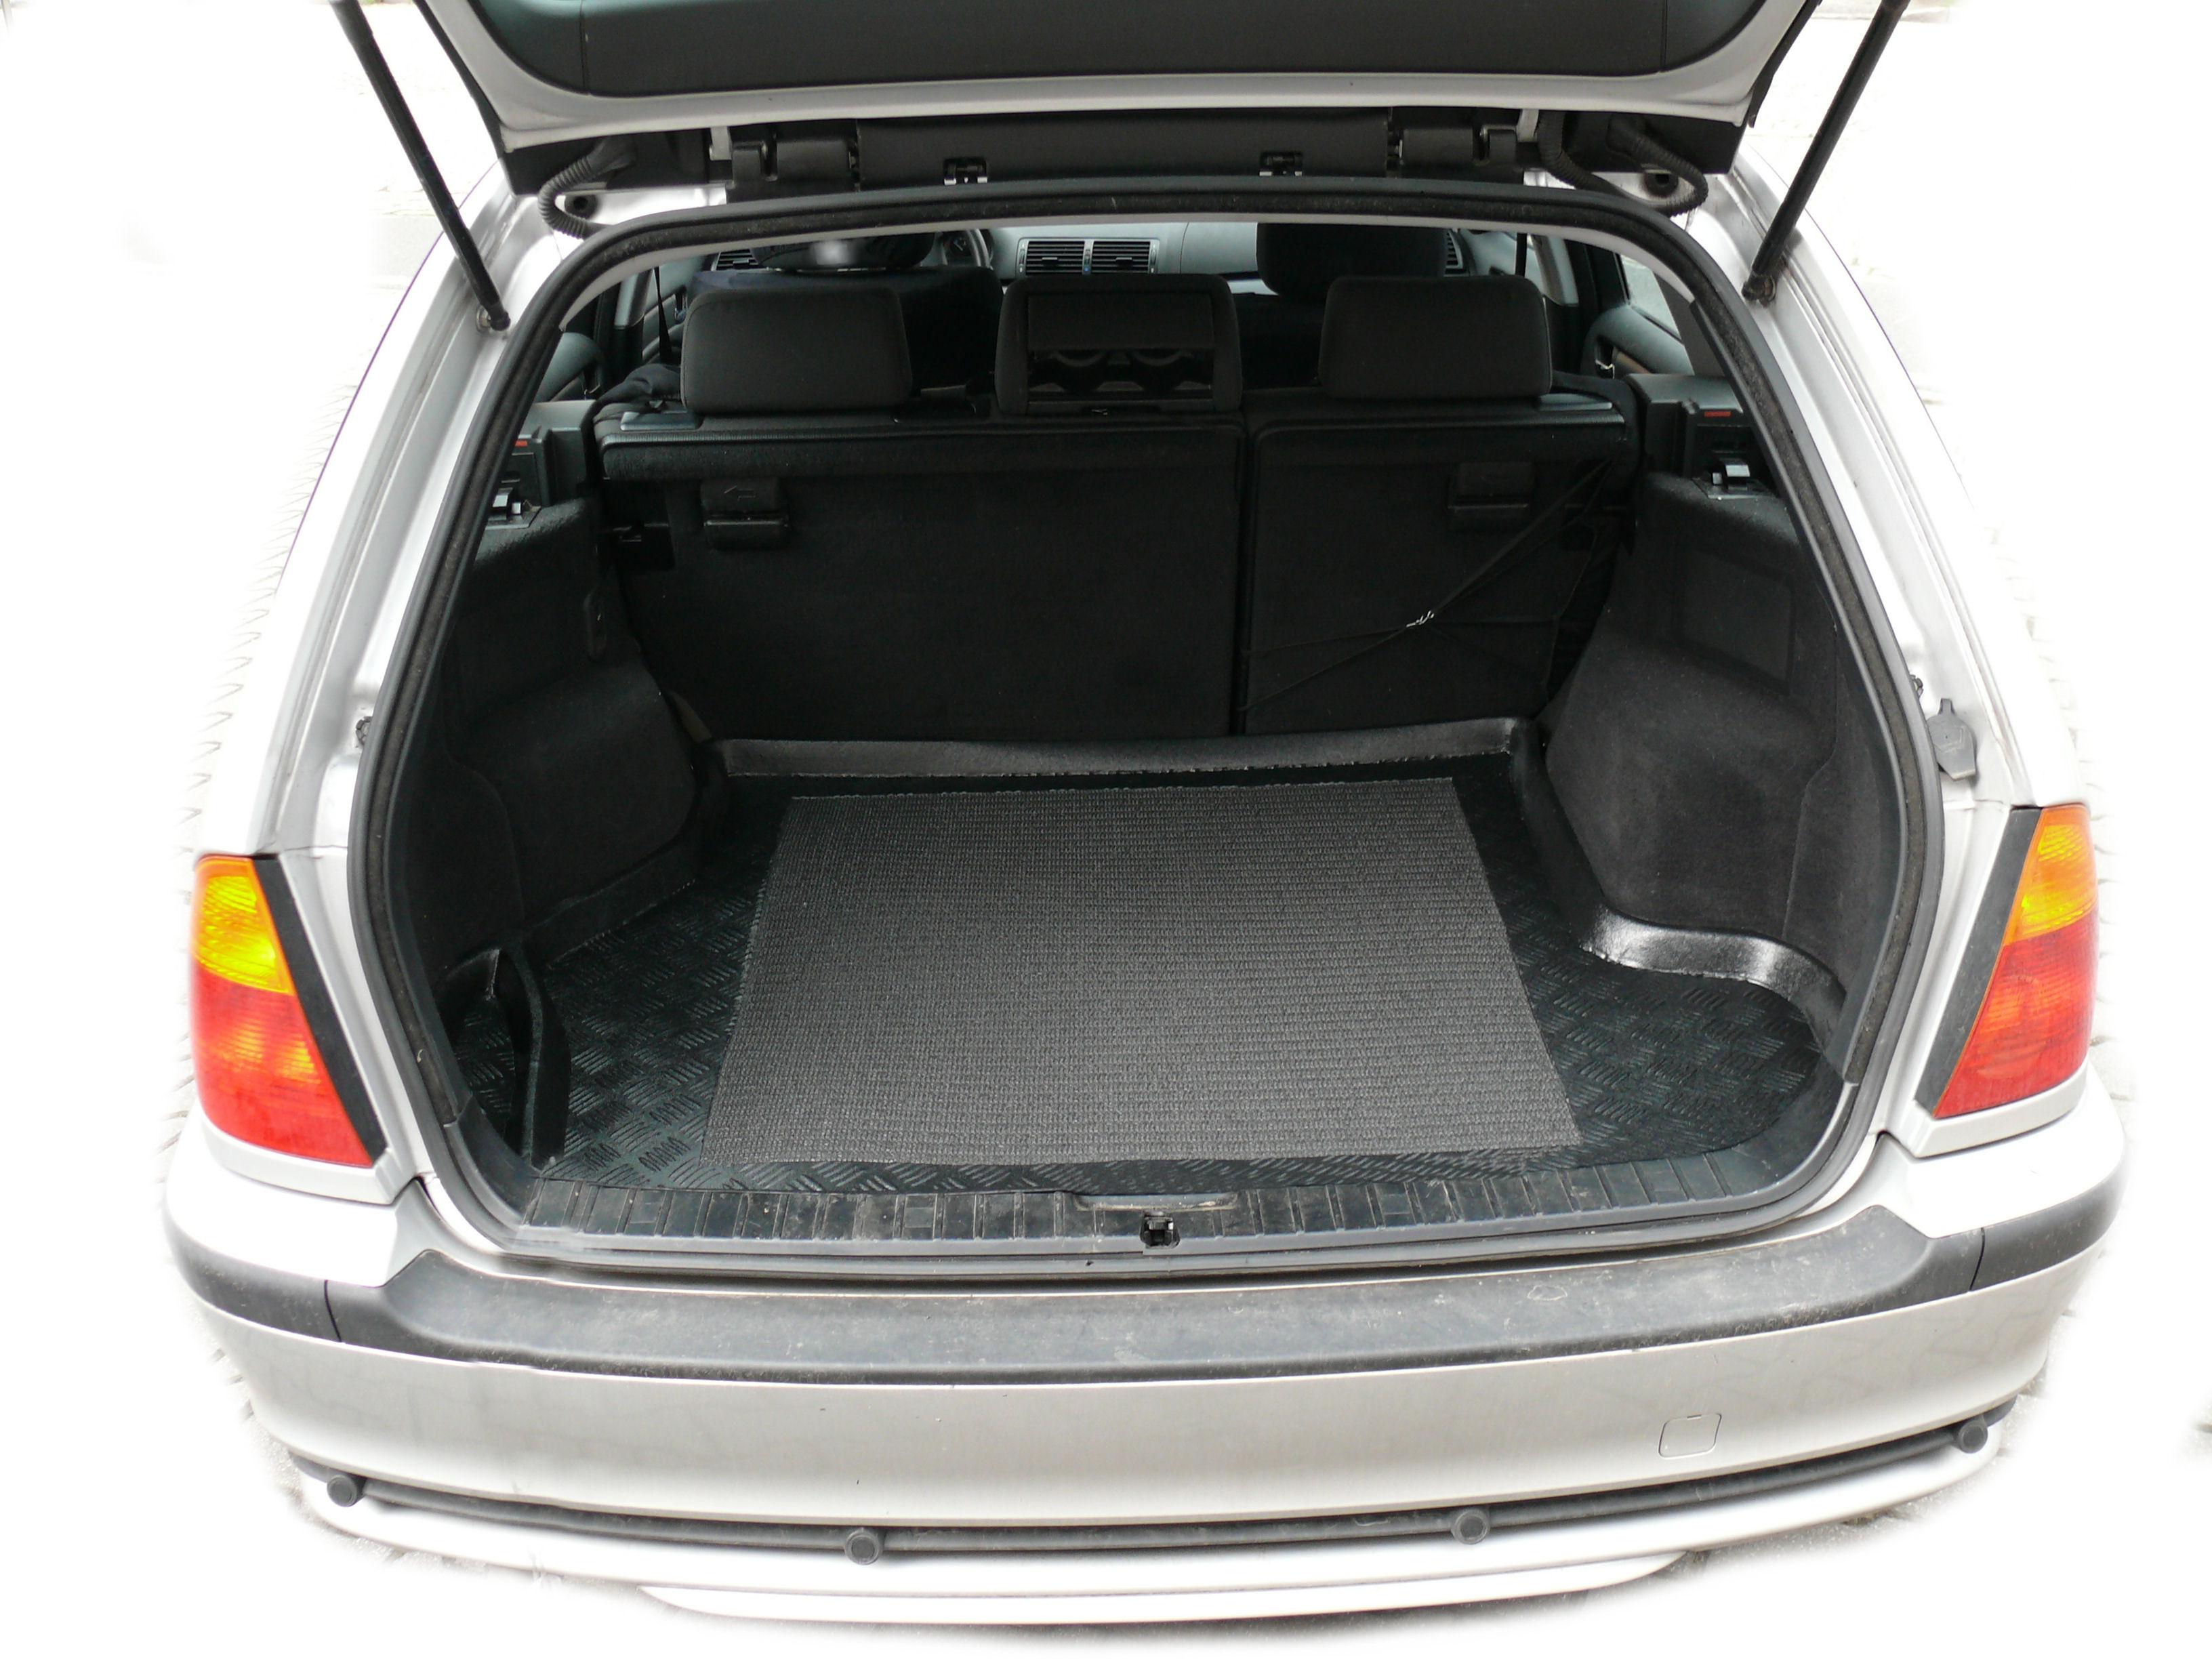 Kofferraumwanne für Peugeot 206 SW Kombi 5-türer 2002-2007